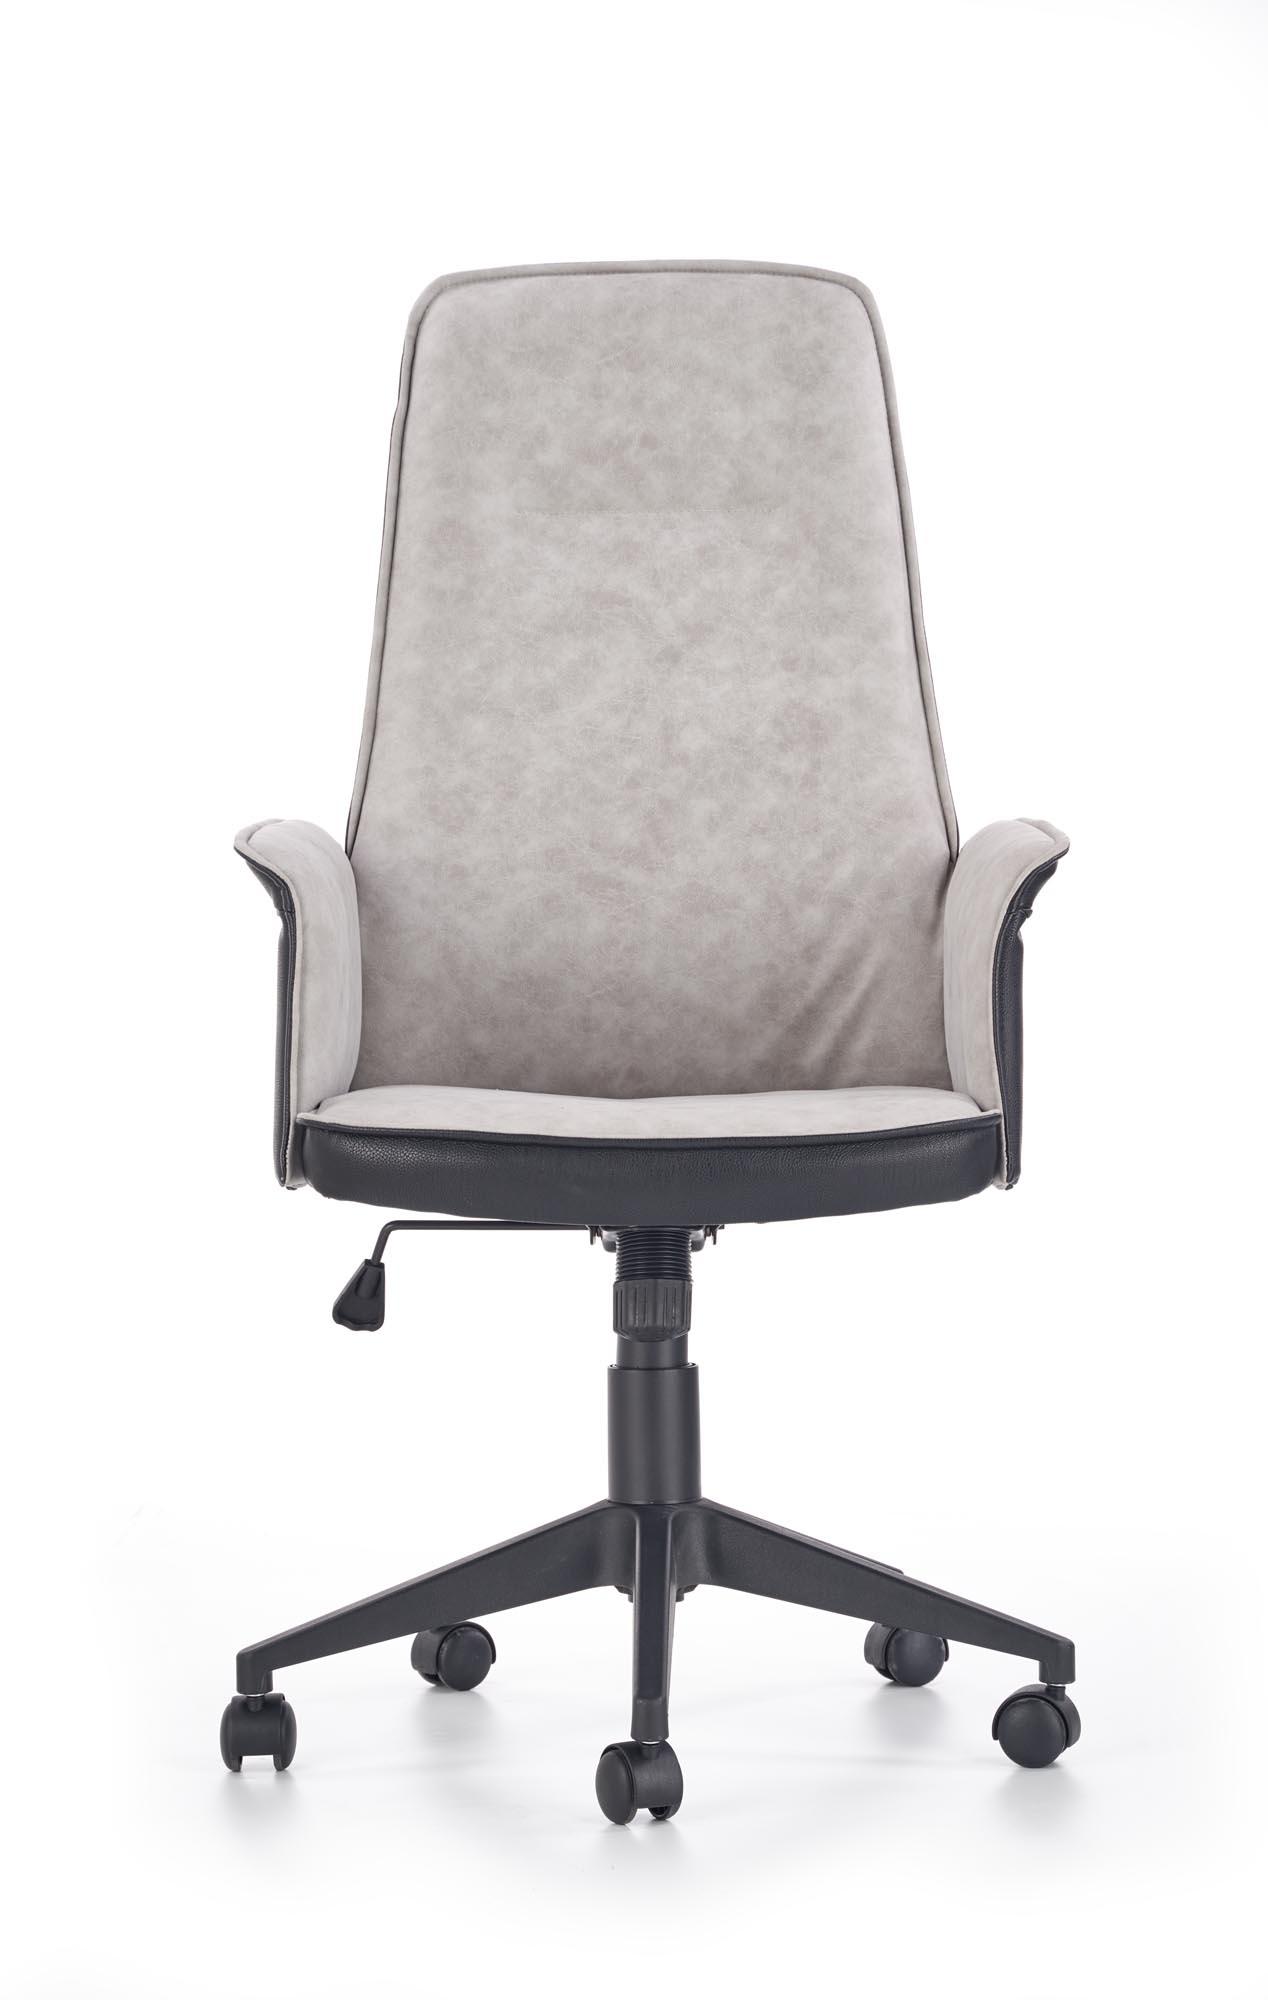 Scaun de birou ergonomic tapitat cu piele ecologica si stofa Tyrus Negru / Gri, l62xA66xH110-120 cm poza